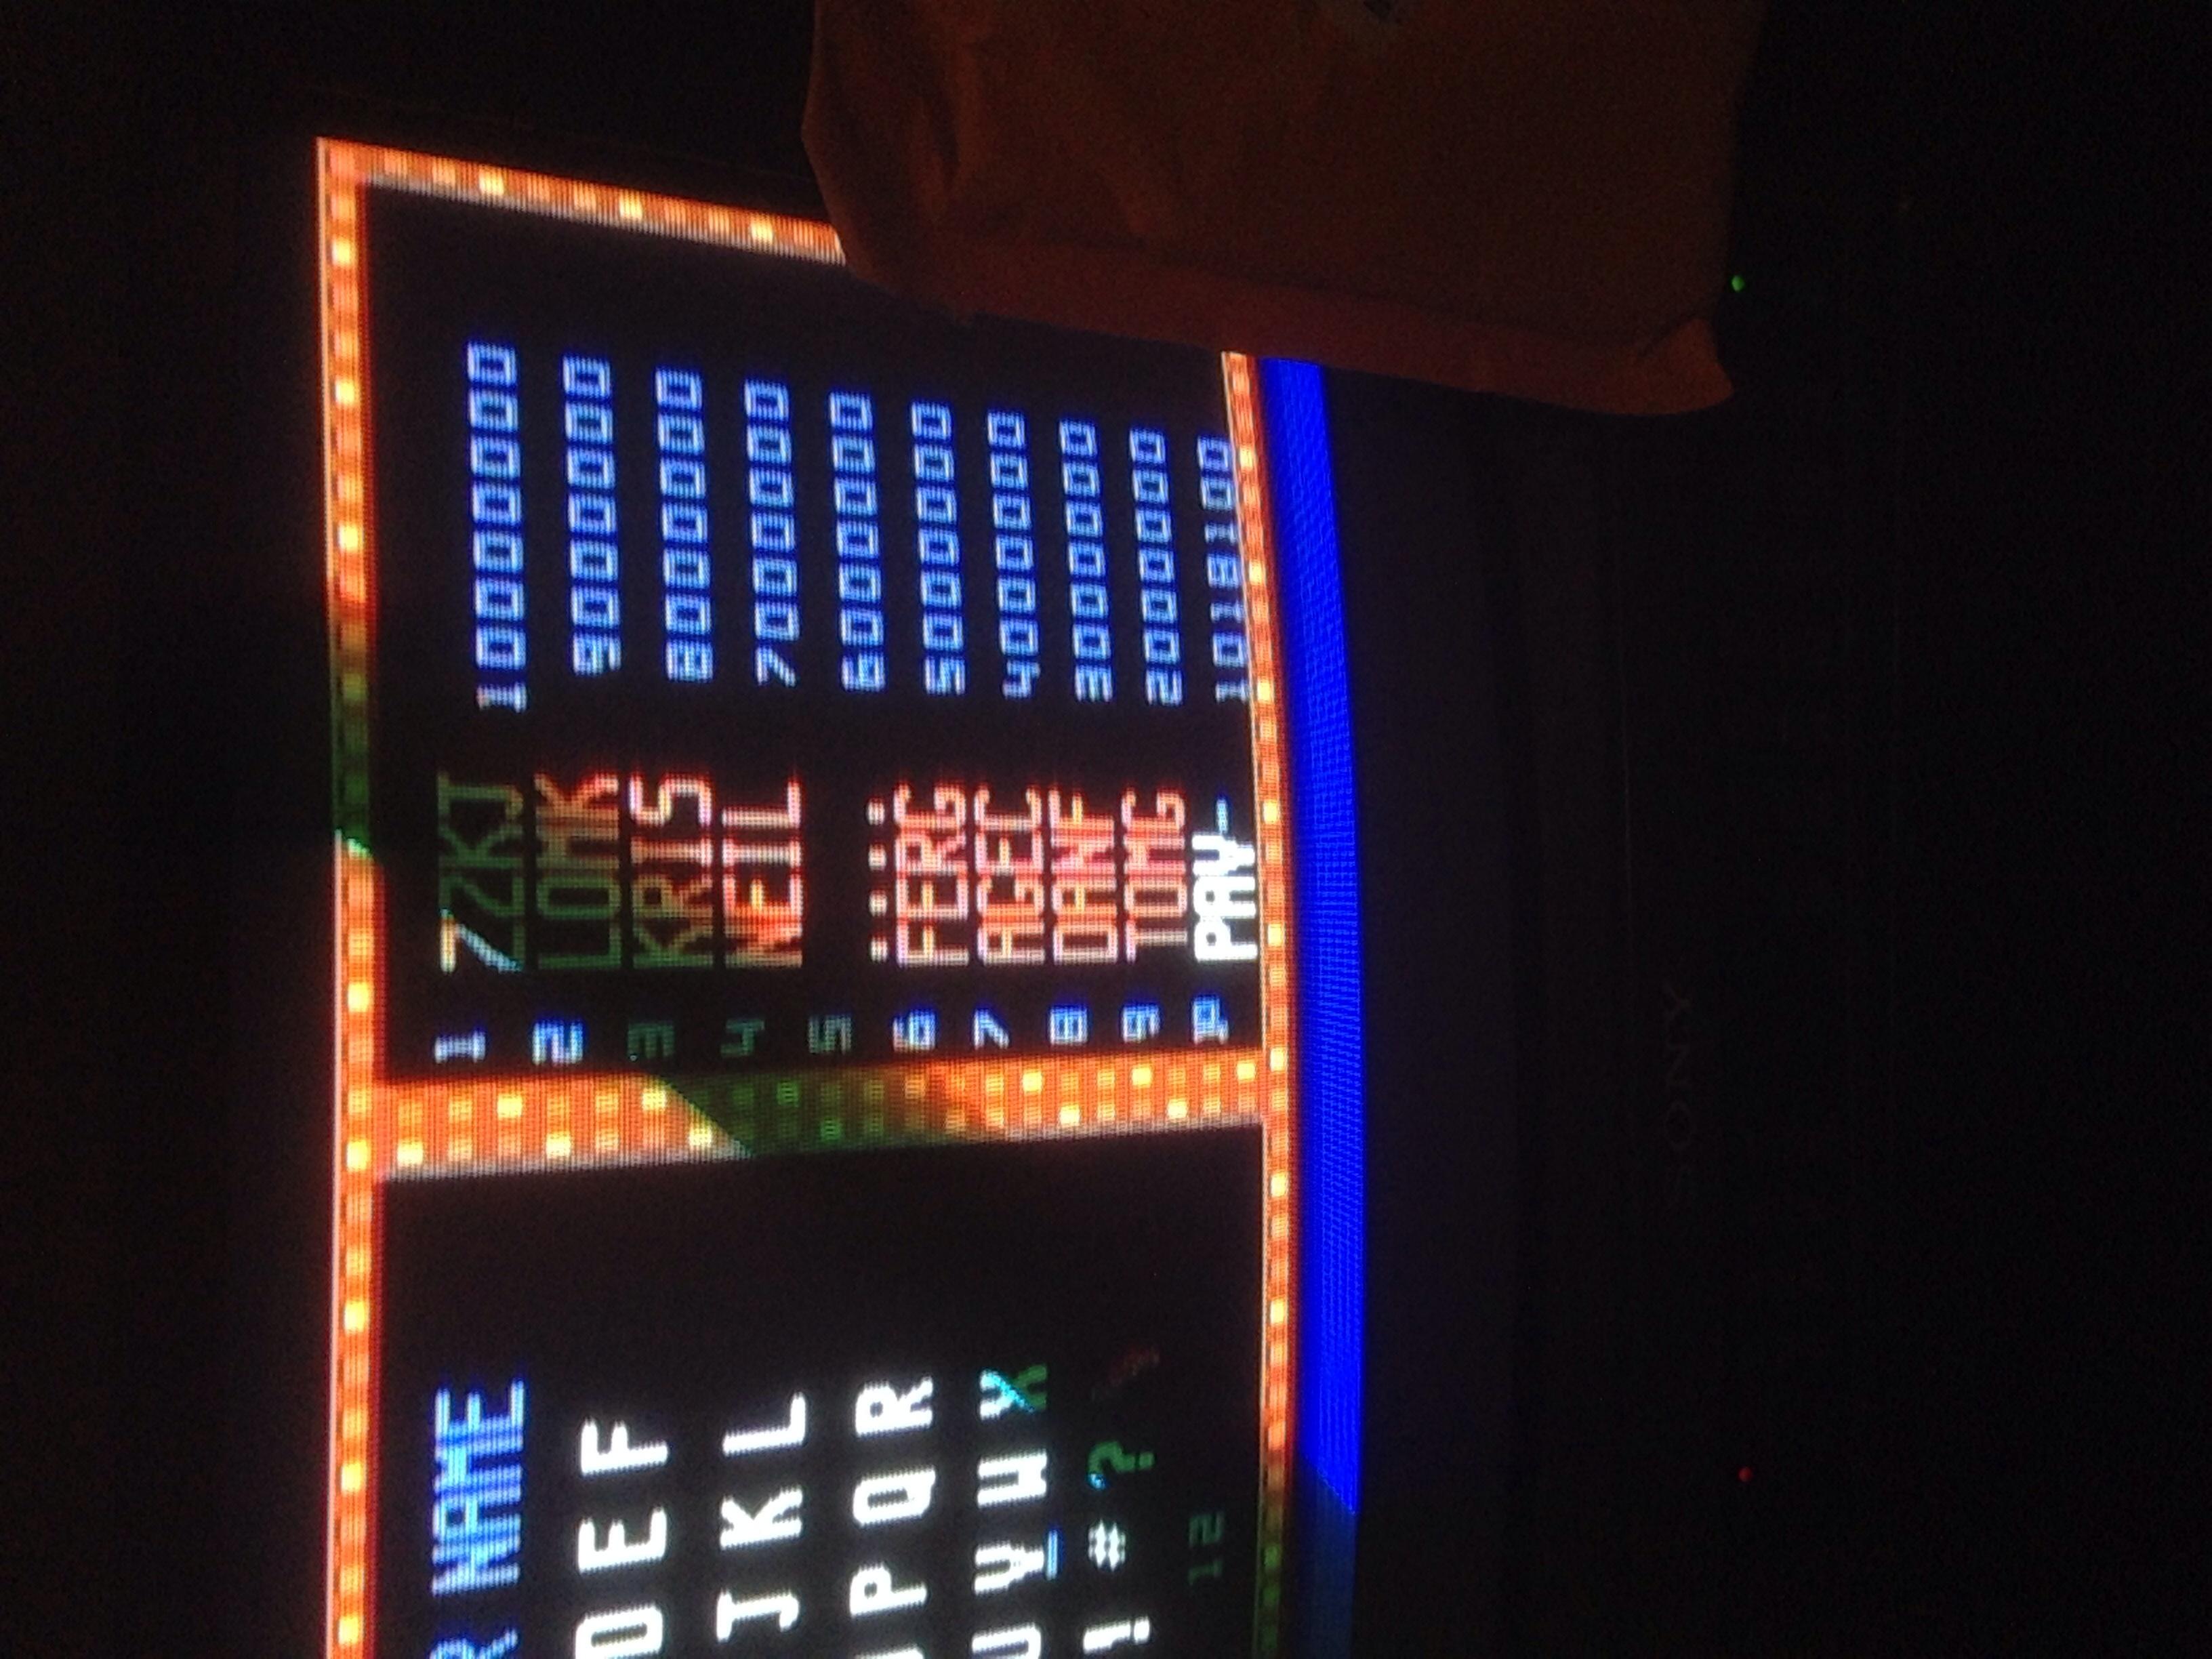 Smash TV 1,018,100 points